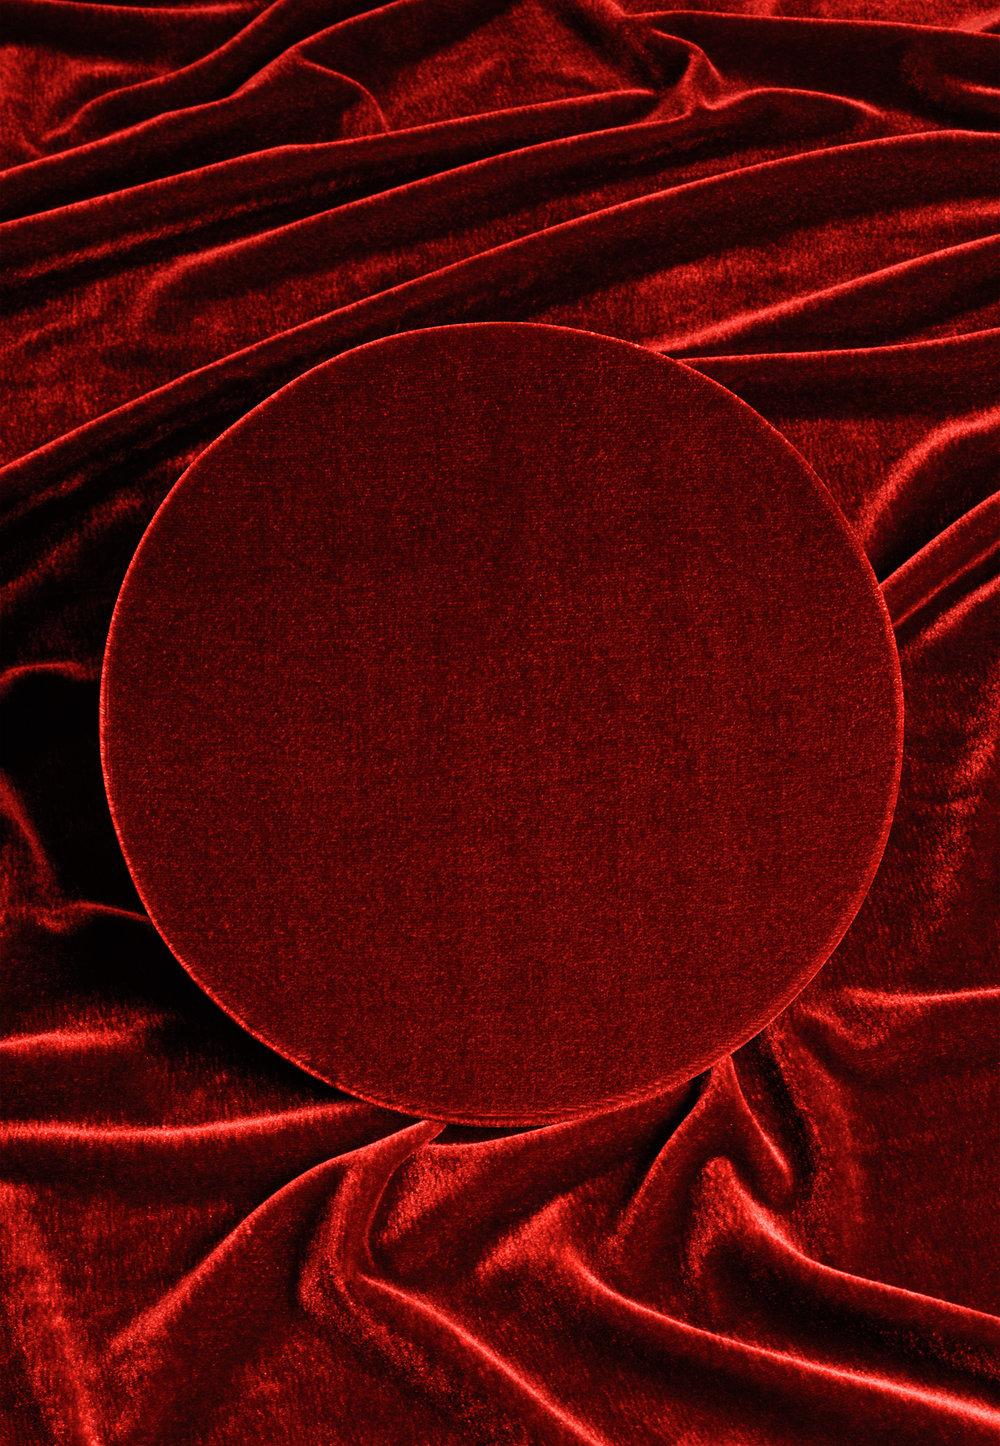 Roter Kreis 2, 2016 C-Print, 52,5 x 36 cm